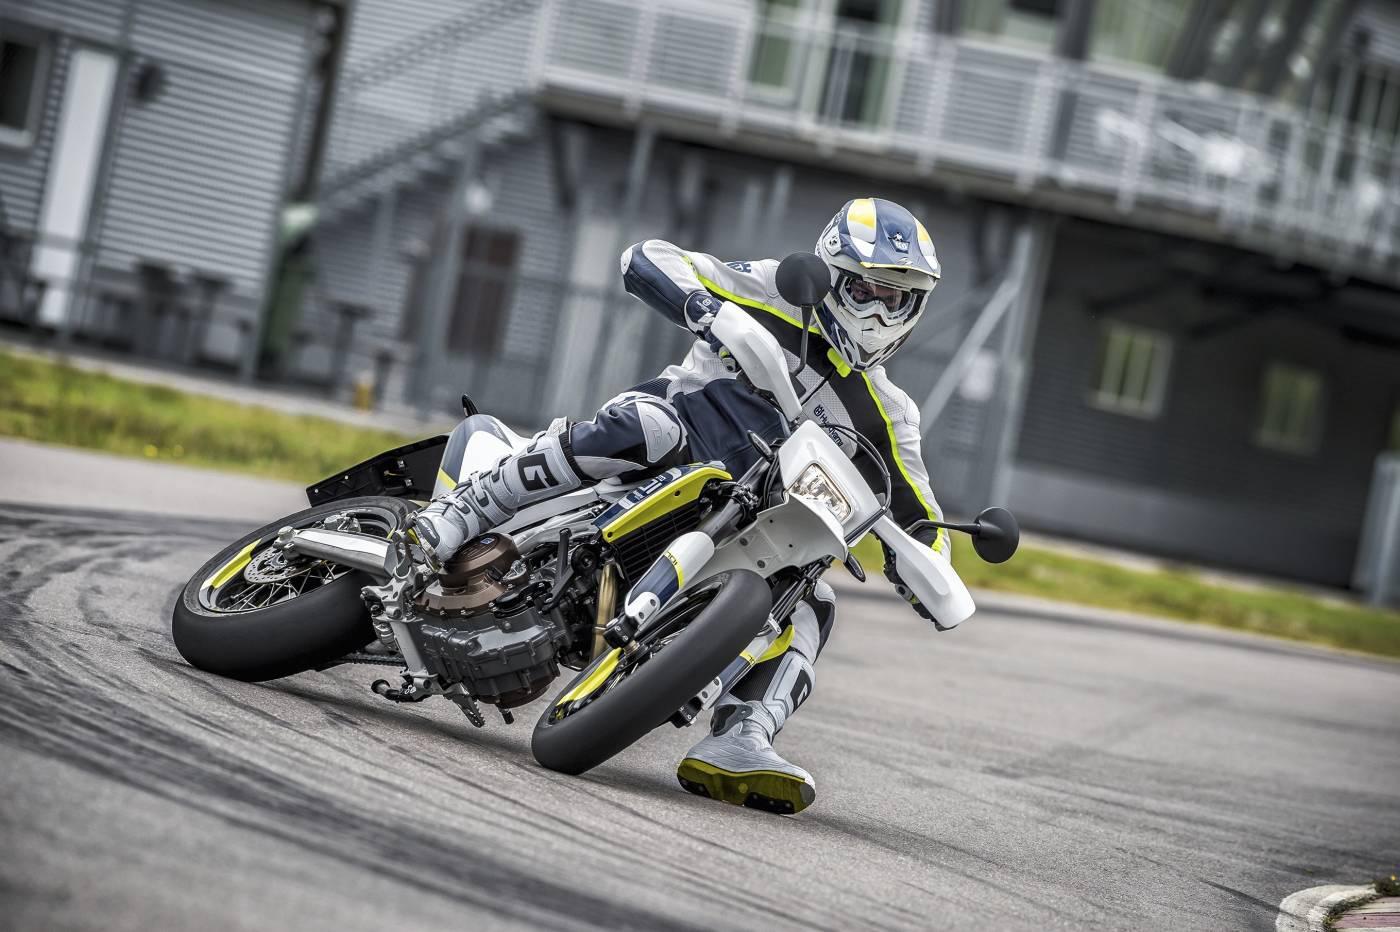 Yamaha Fz Wheelie